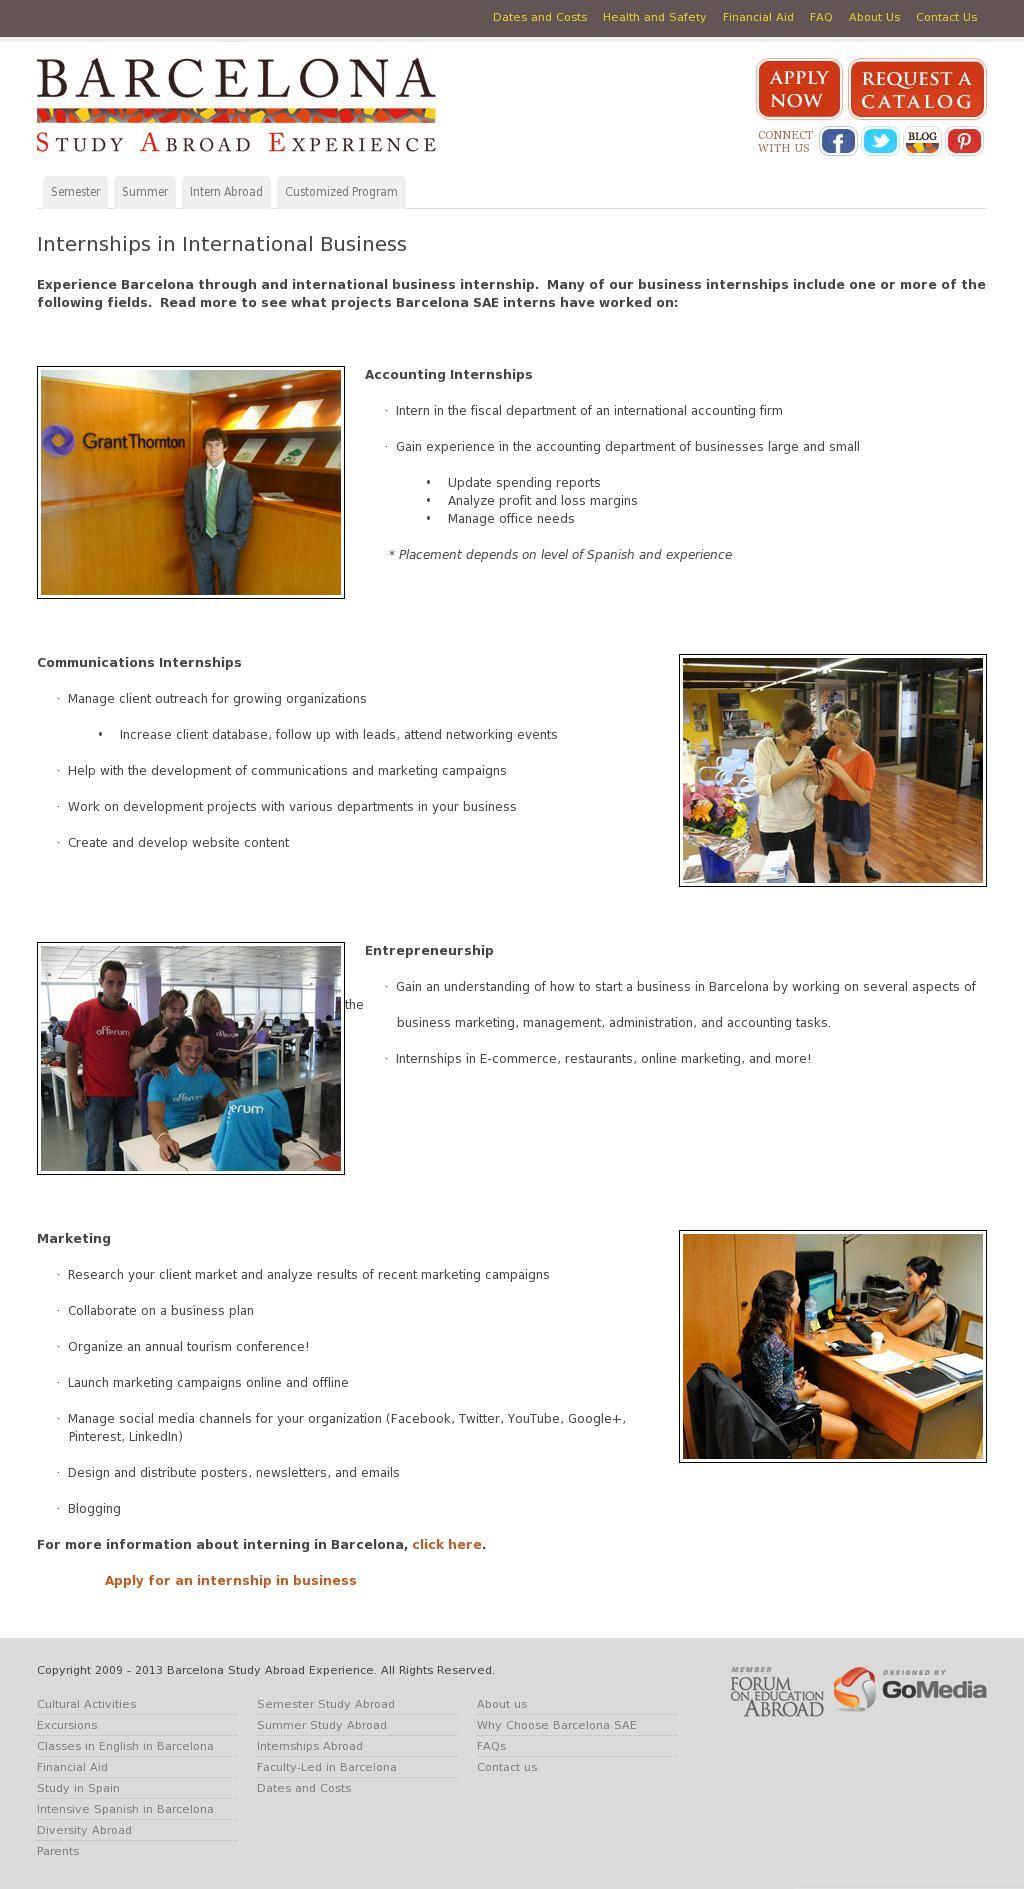 International Business Internships In Barcelona Business Experience Internship Work Development